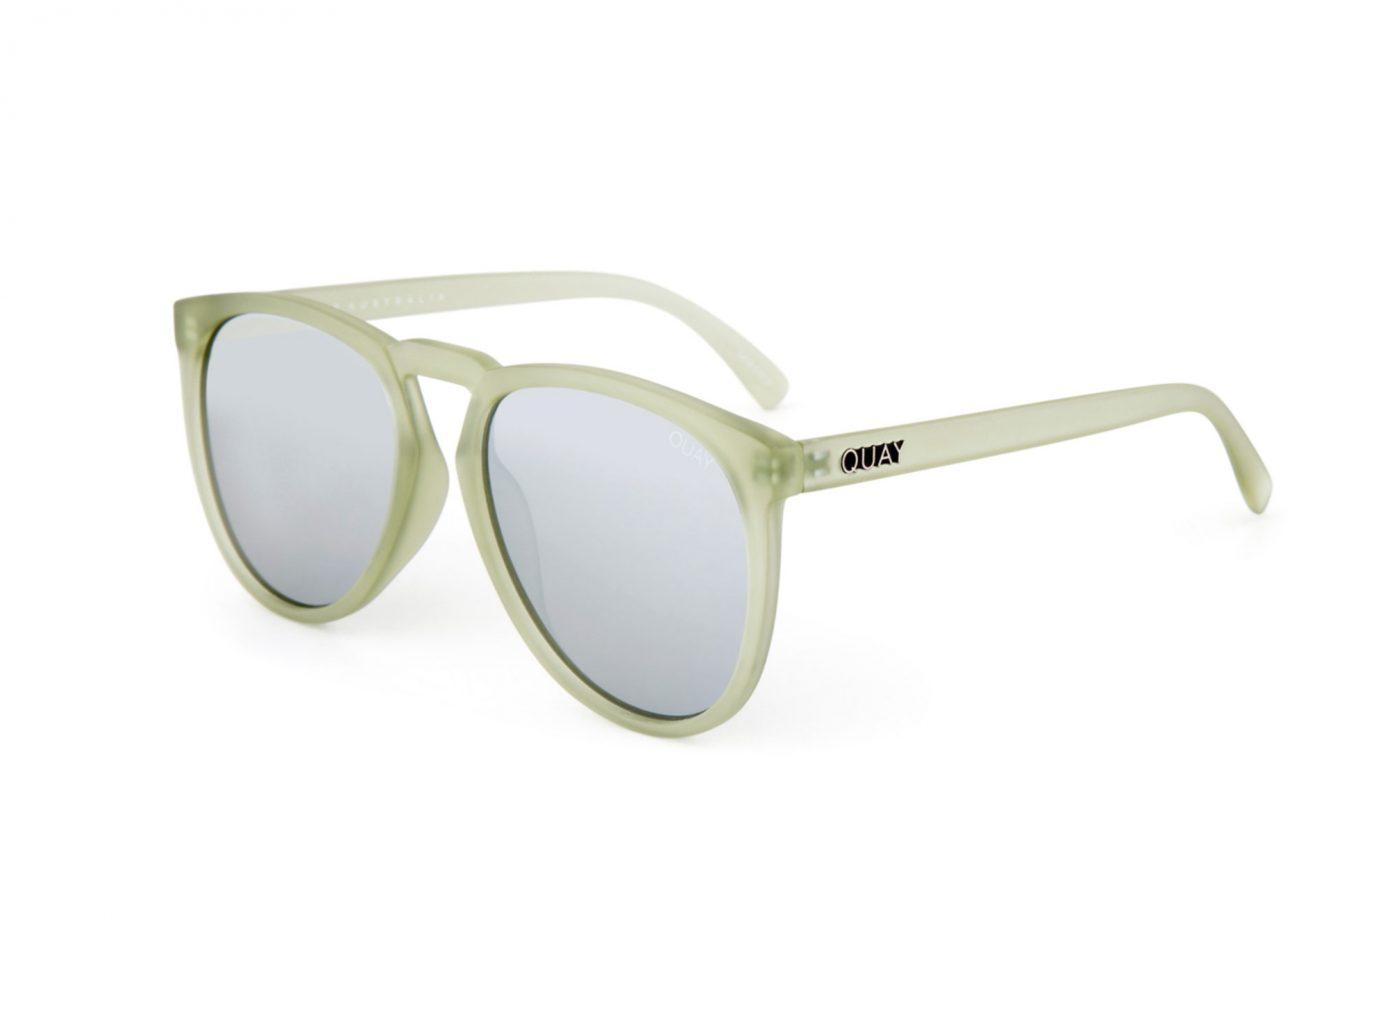 ASOS Quay Australia Retro Sunglasses